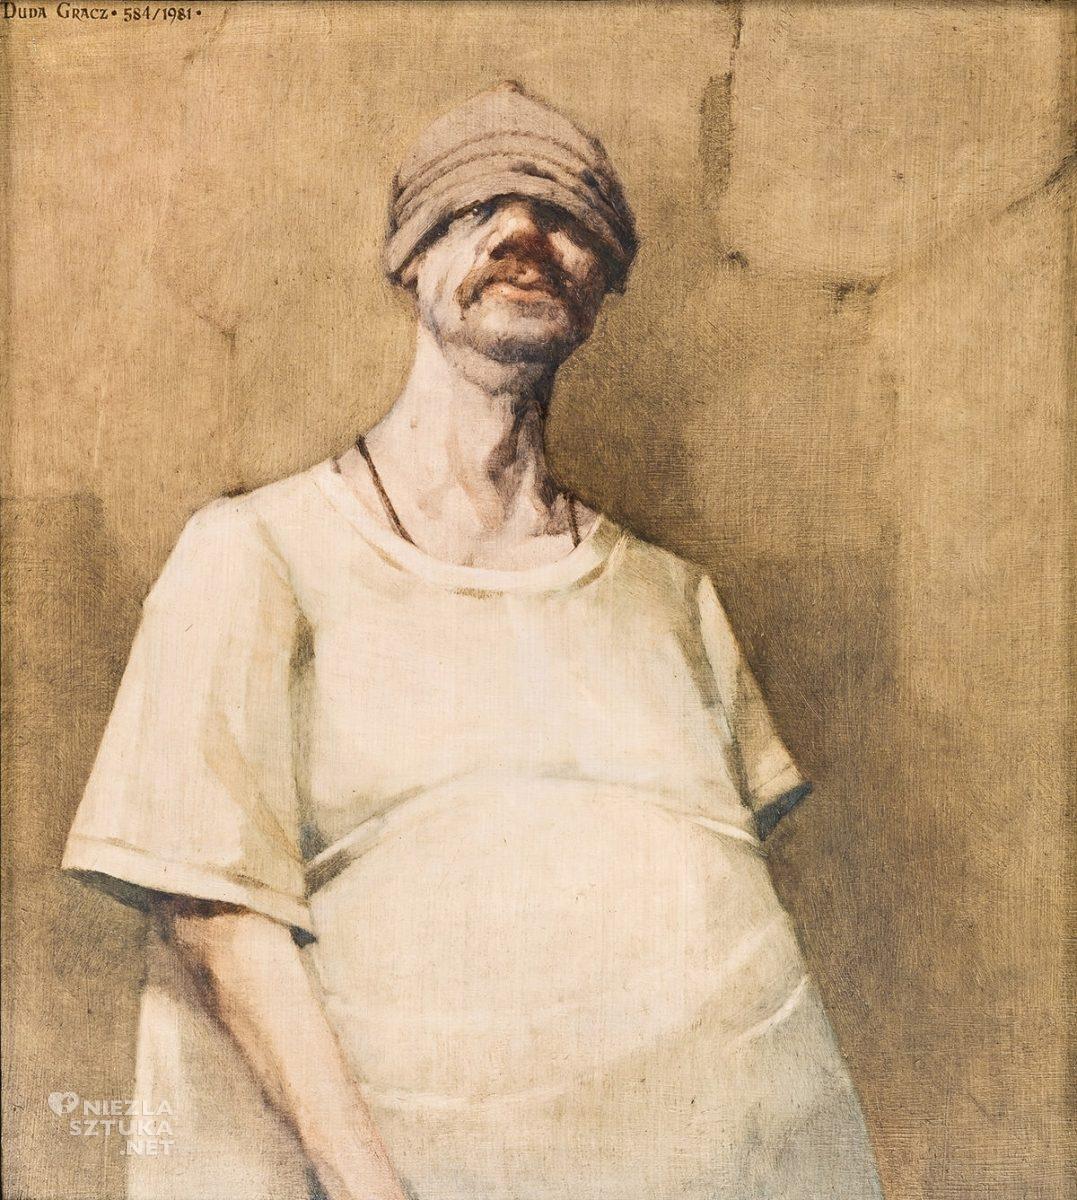 Jerzy Duda-Gracz, Autoportret-Czapa, sztuka współczesna, sztuka polska, Niezła Sztuka